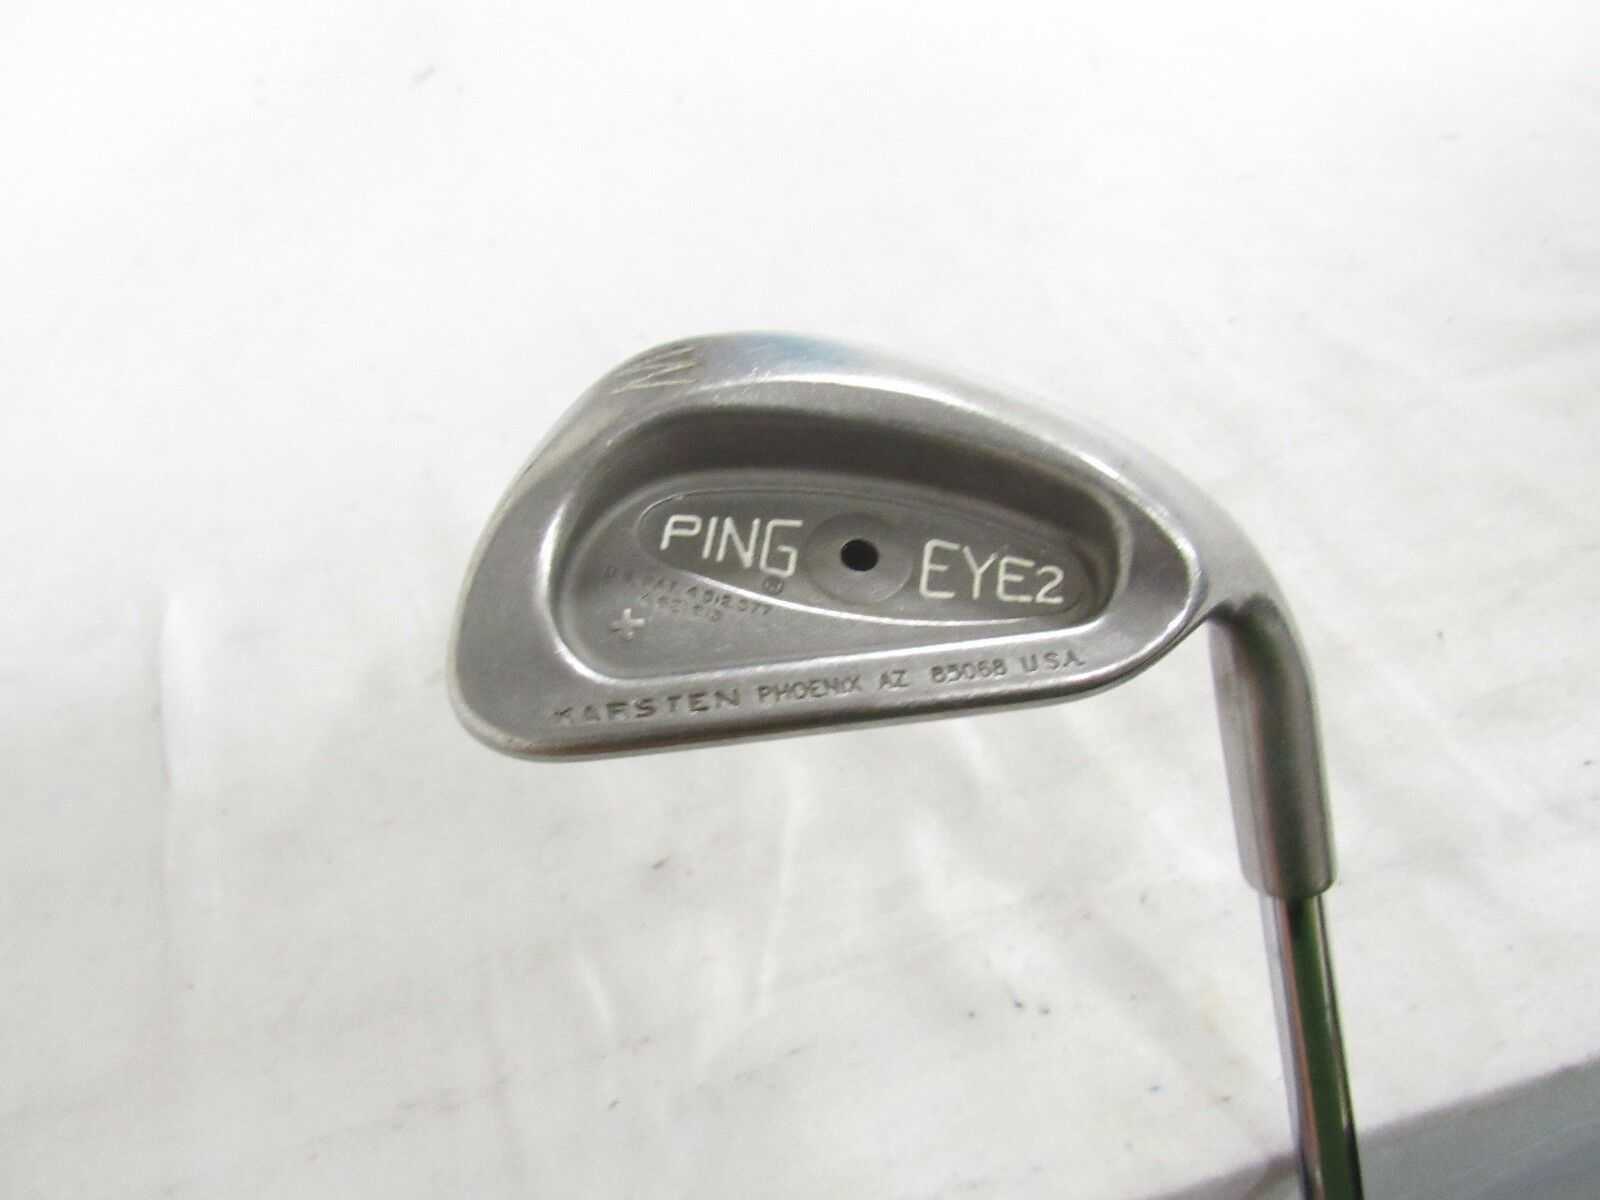 Usado RH Ping Eye 2+ (punto Negro) pitcheo W Cuña Ping ZZ Lite Acero rígido de la flexión S